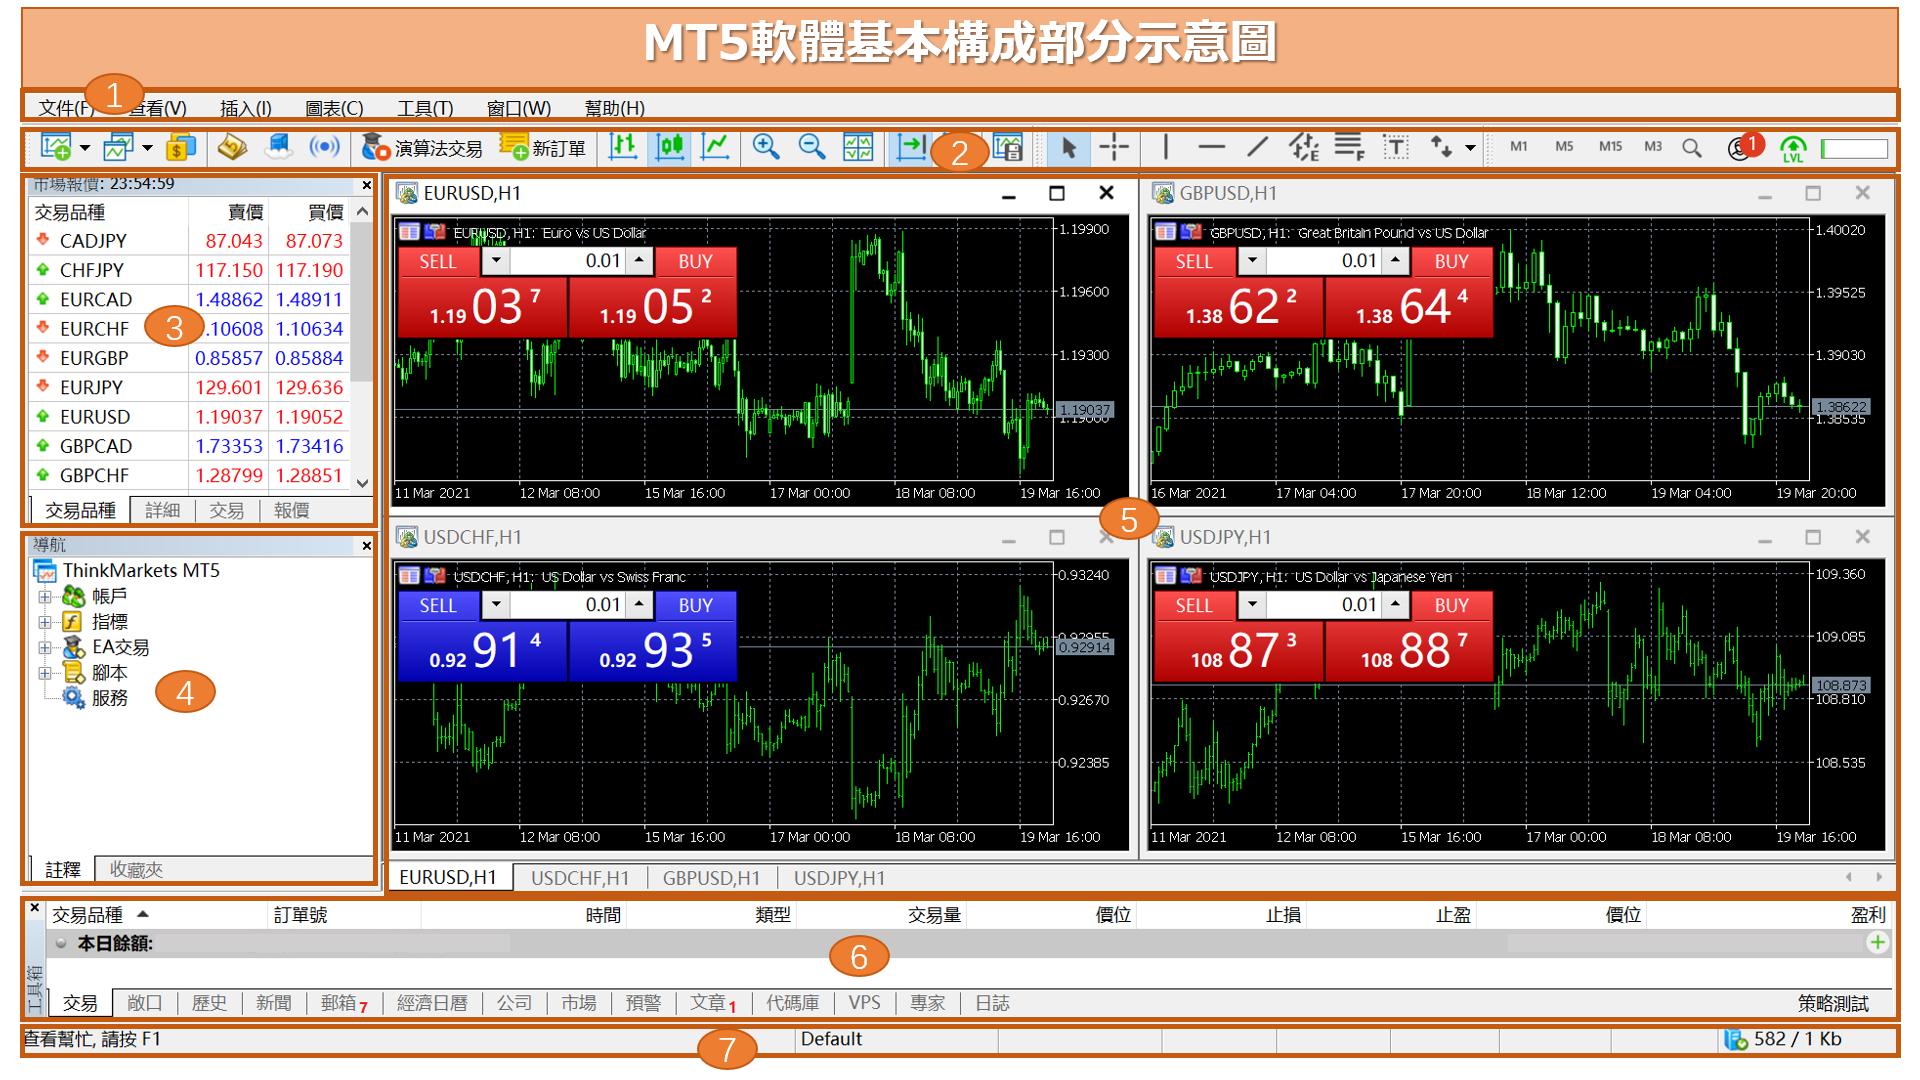 MT5軟體基本構成部分示意圖